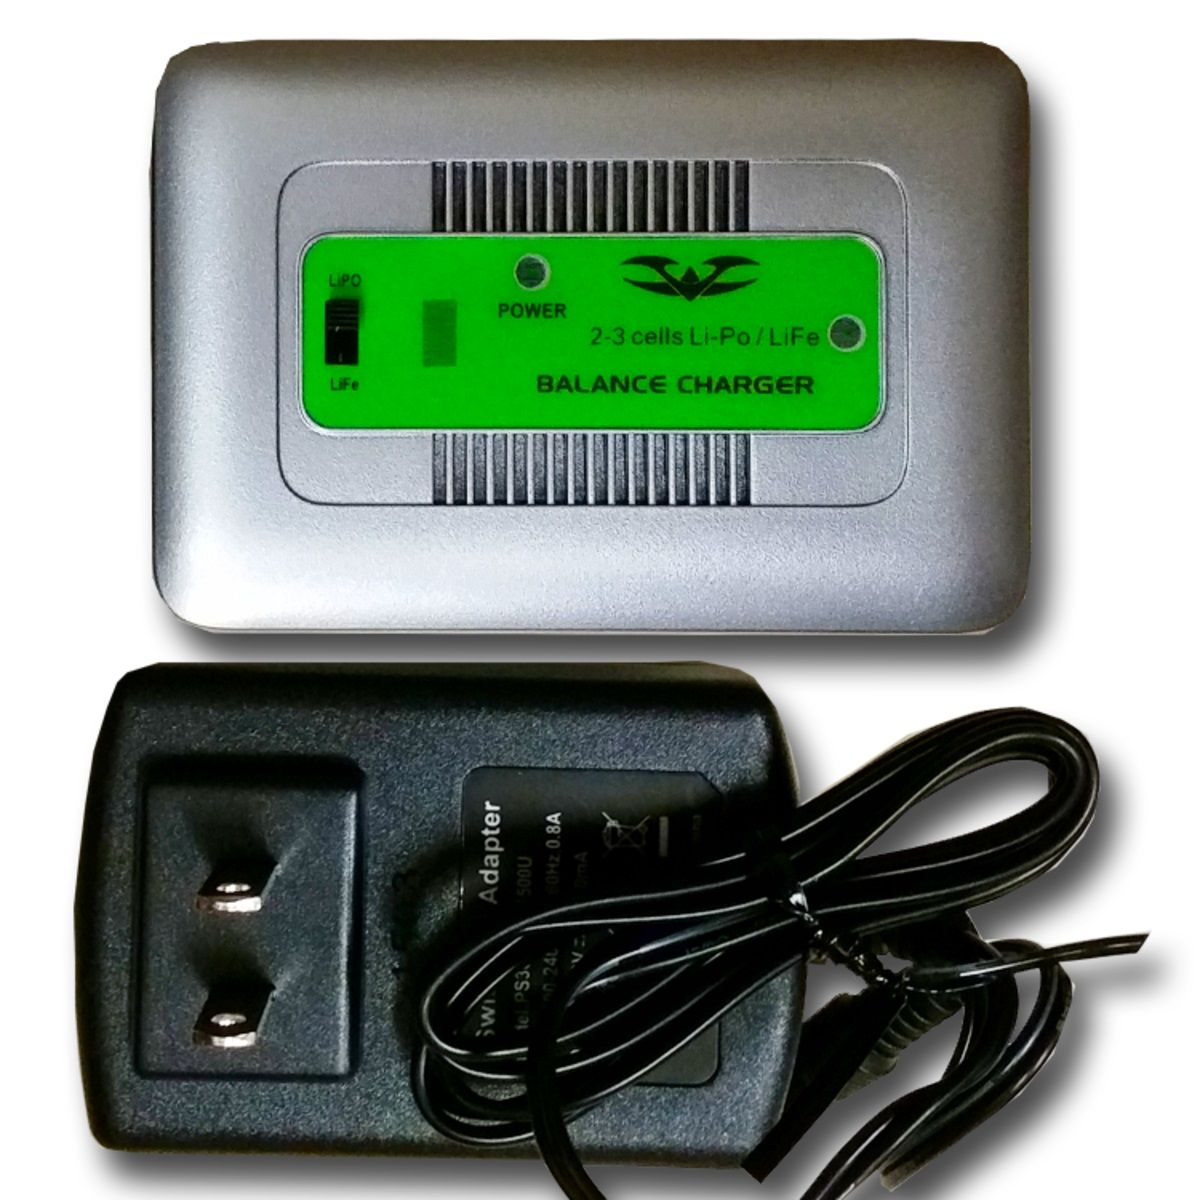 Valken Energy 23 Cell LiPo/LiFe Smart Balancing Battery